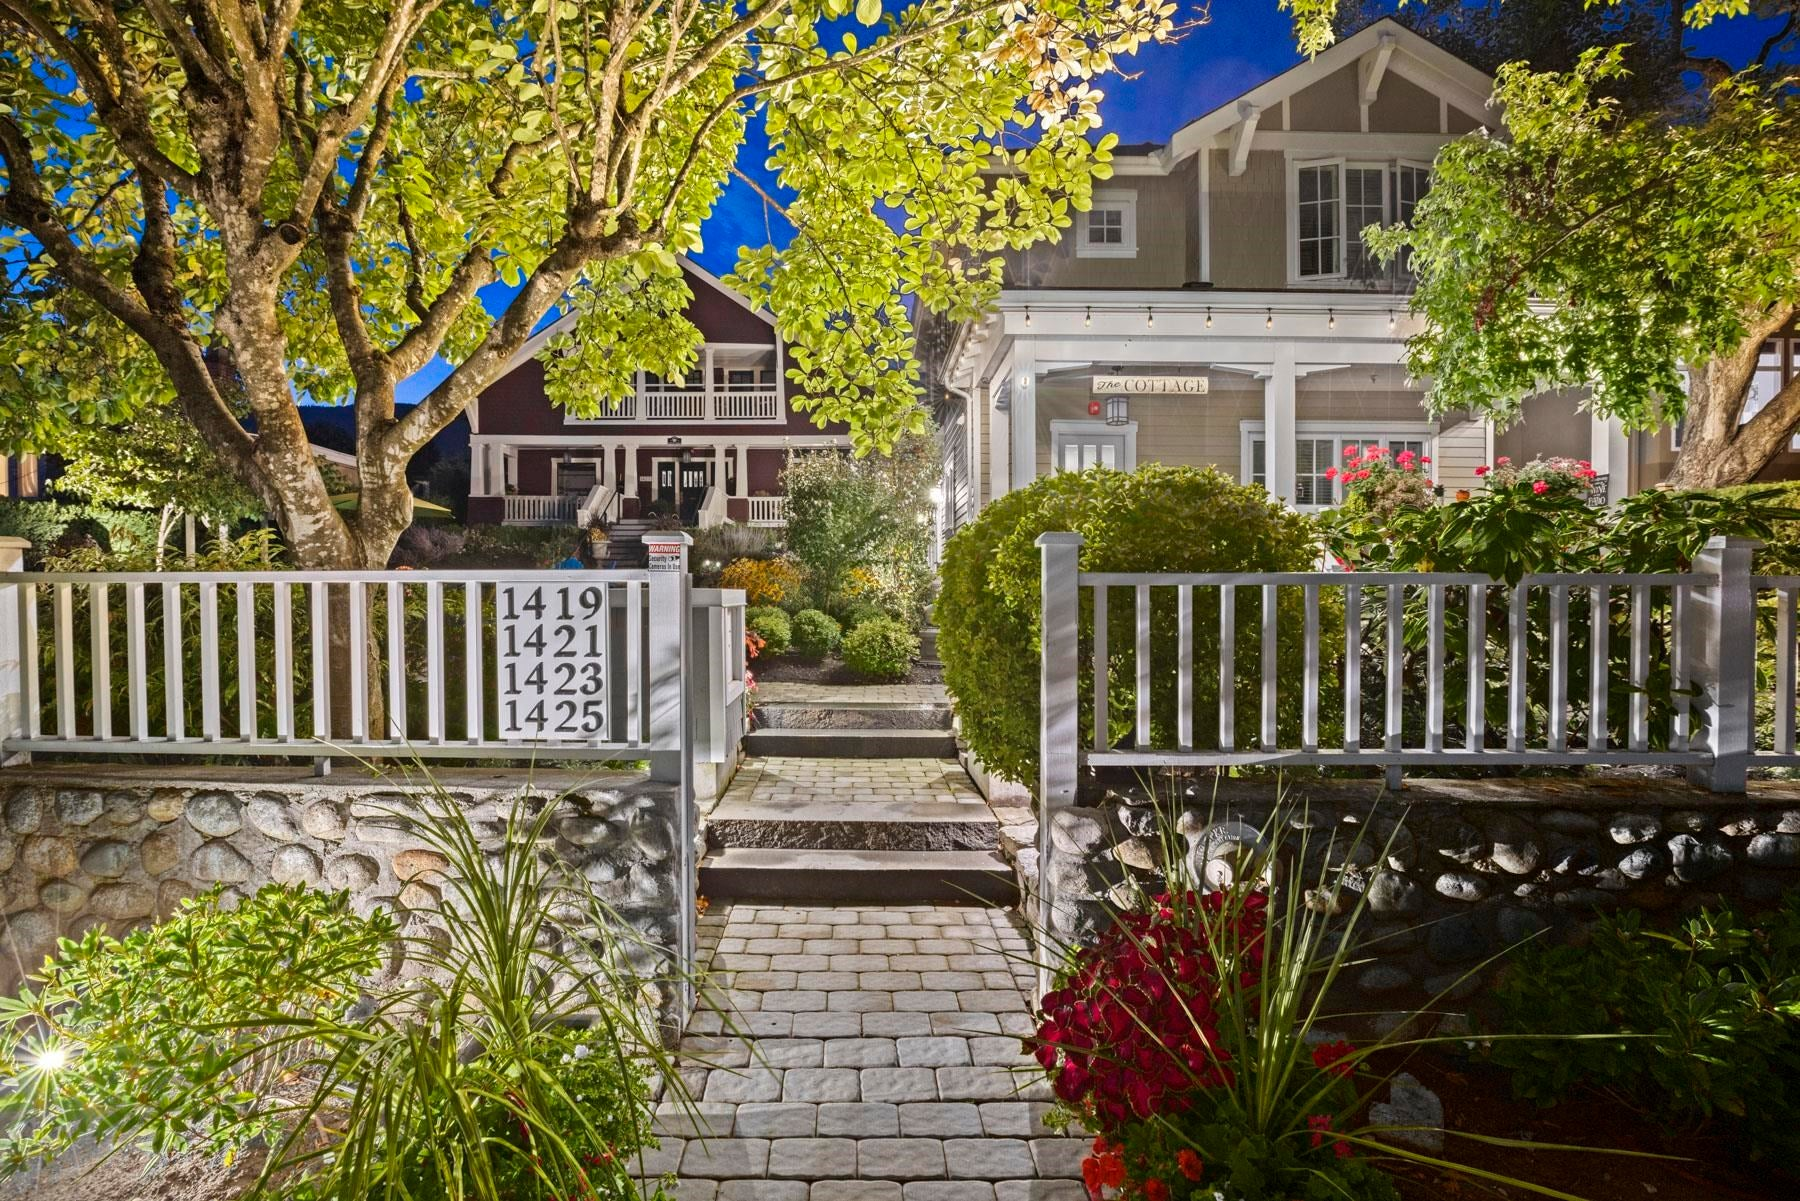 1421 GORDON AVENUE - Ambleside House/Single Family for sale, 3 Bedrooms (R2617756) - #21